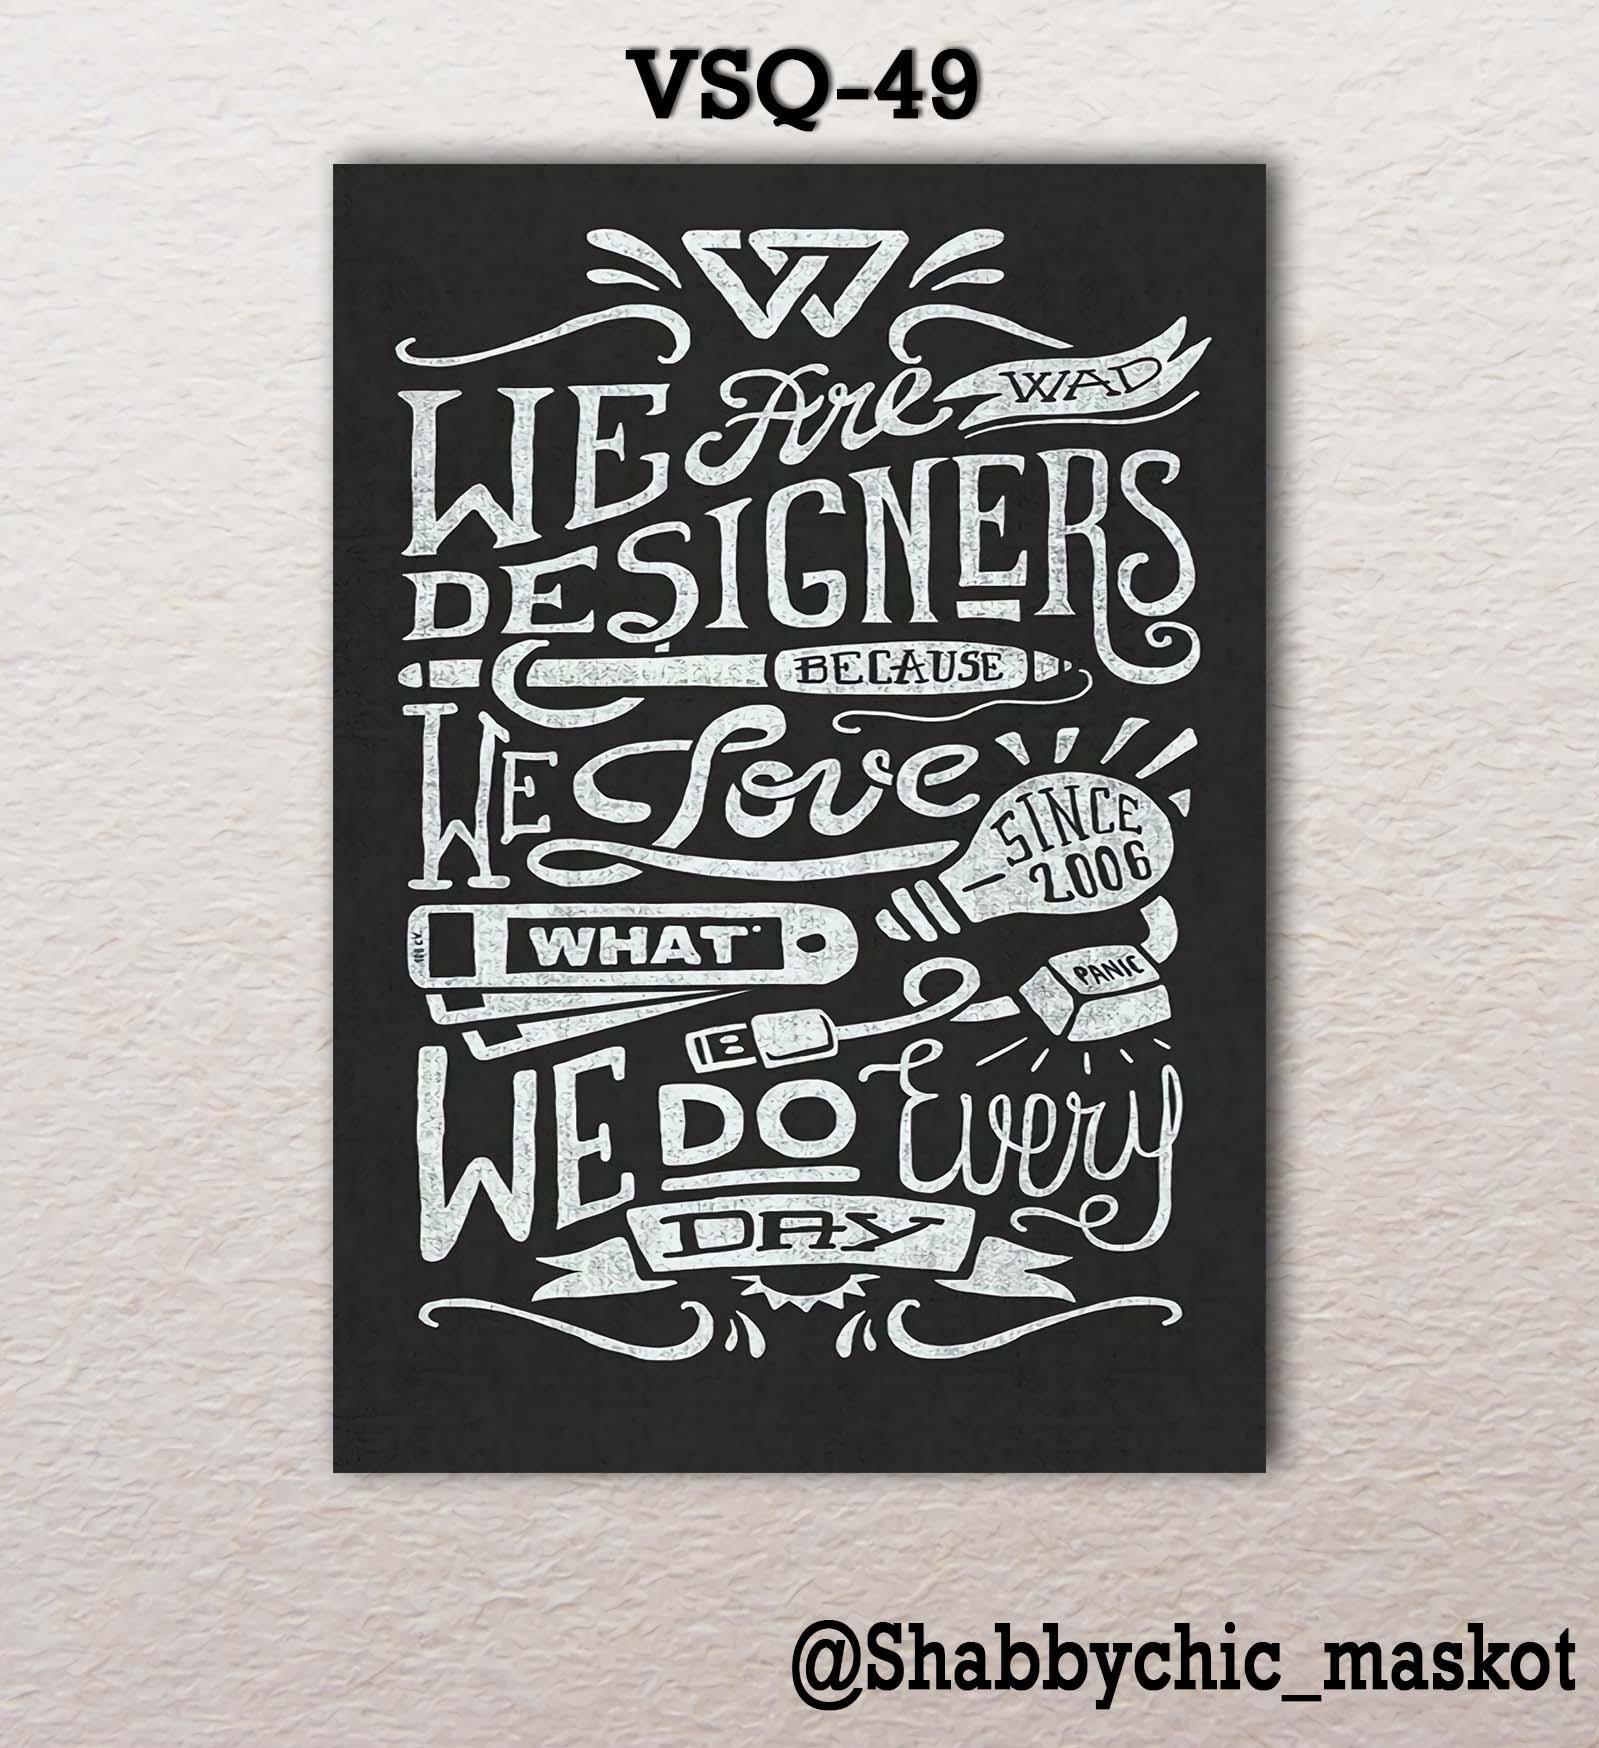 Vasty Hiasan Dinding Kayu Wall Decor Poster Super Quotes VSQ-49